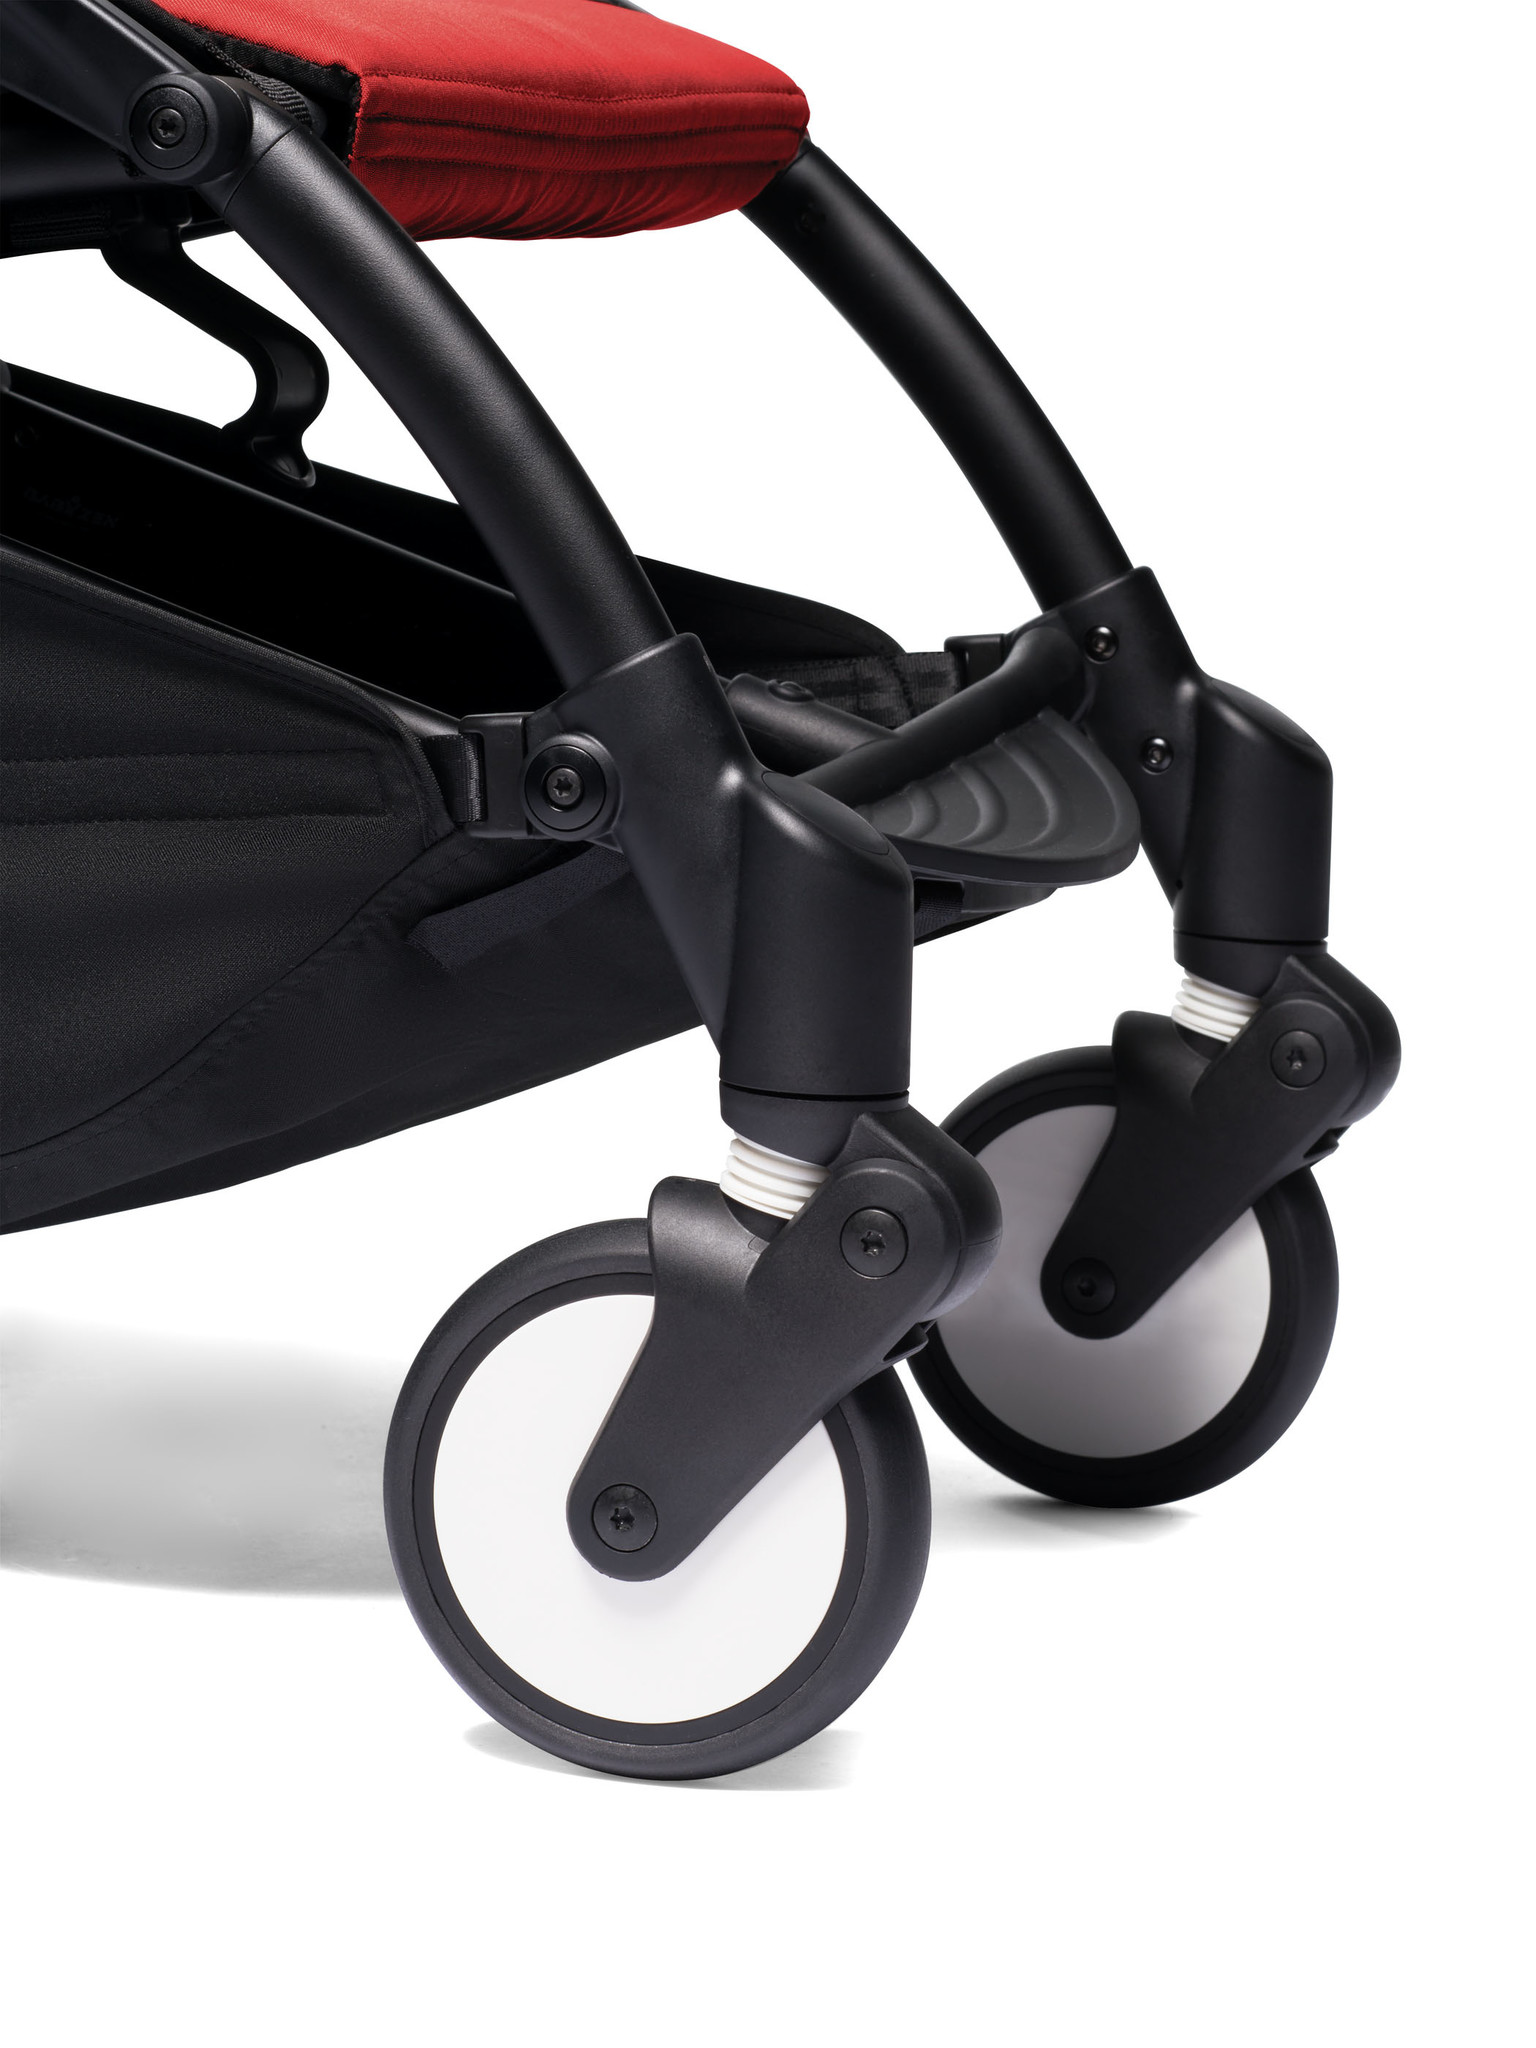 Babyzen Babyzen YOYO² buggy COMPLEET / FULL SET 0+ and 6+ rood frame zwart